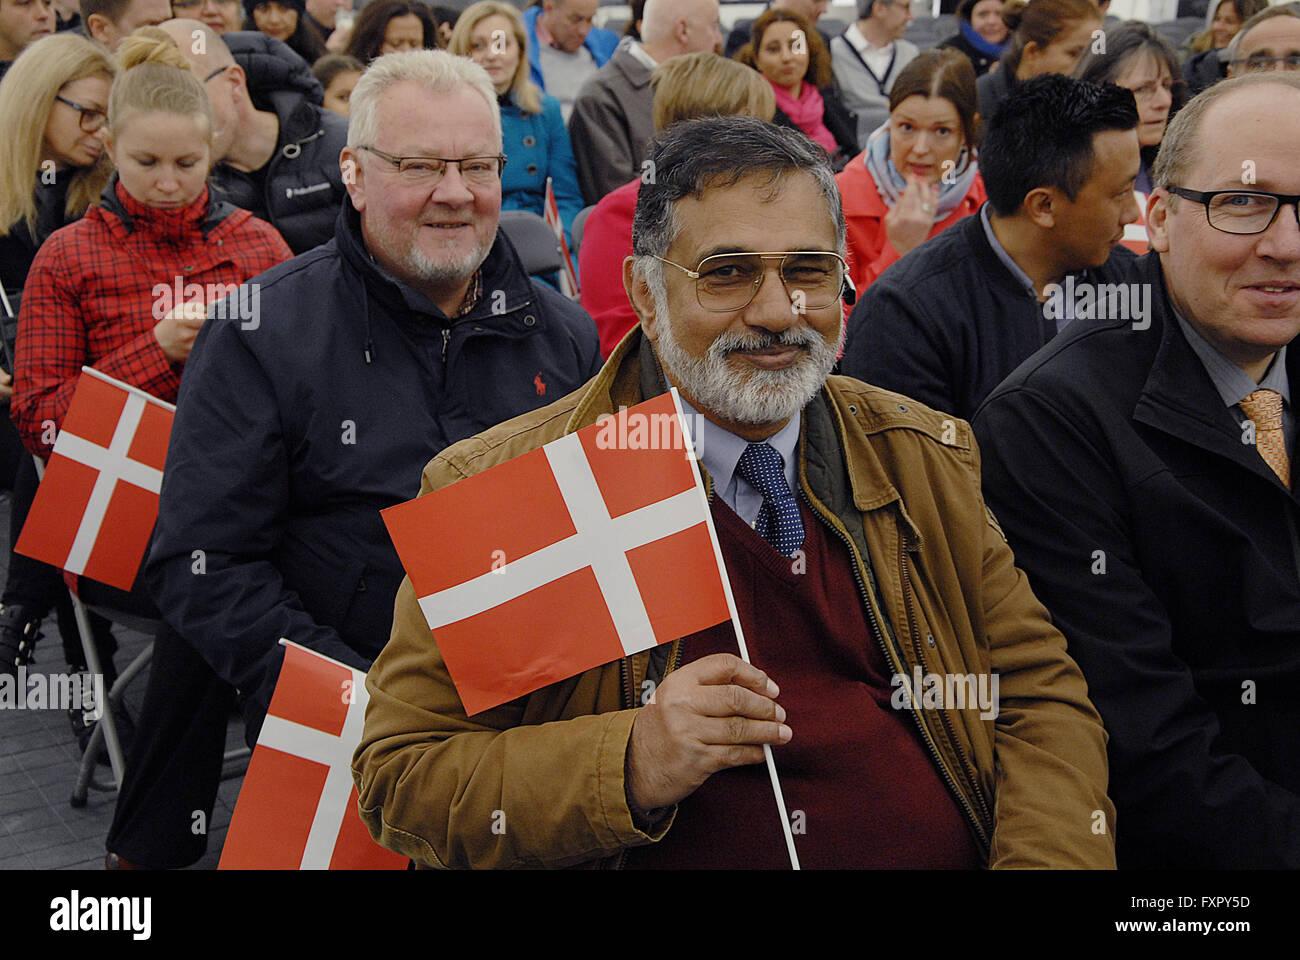 Copenhagen, Denmark. 17th April, 2016. Syed Tauqir Hassan Bokari from Pakistan punjab province celebrates his danish - Stock Image